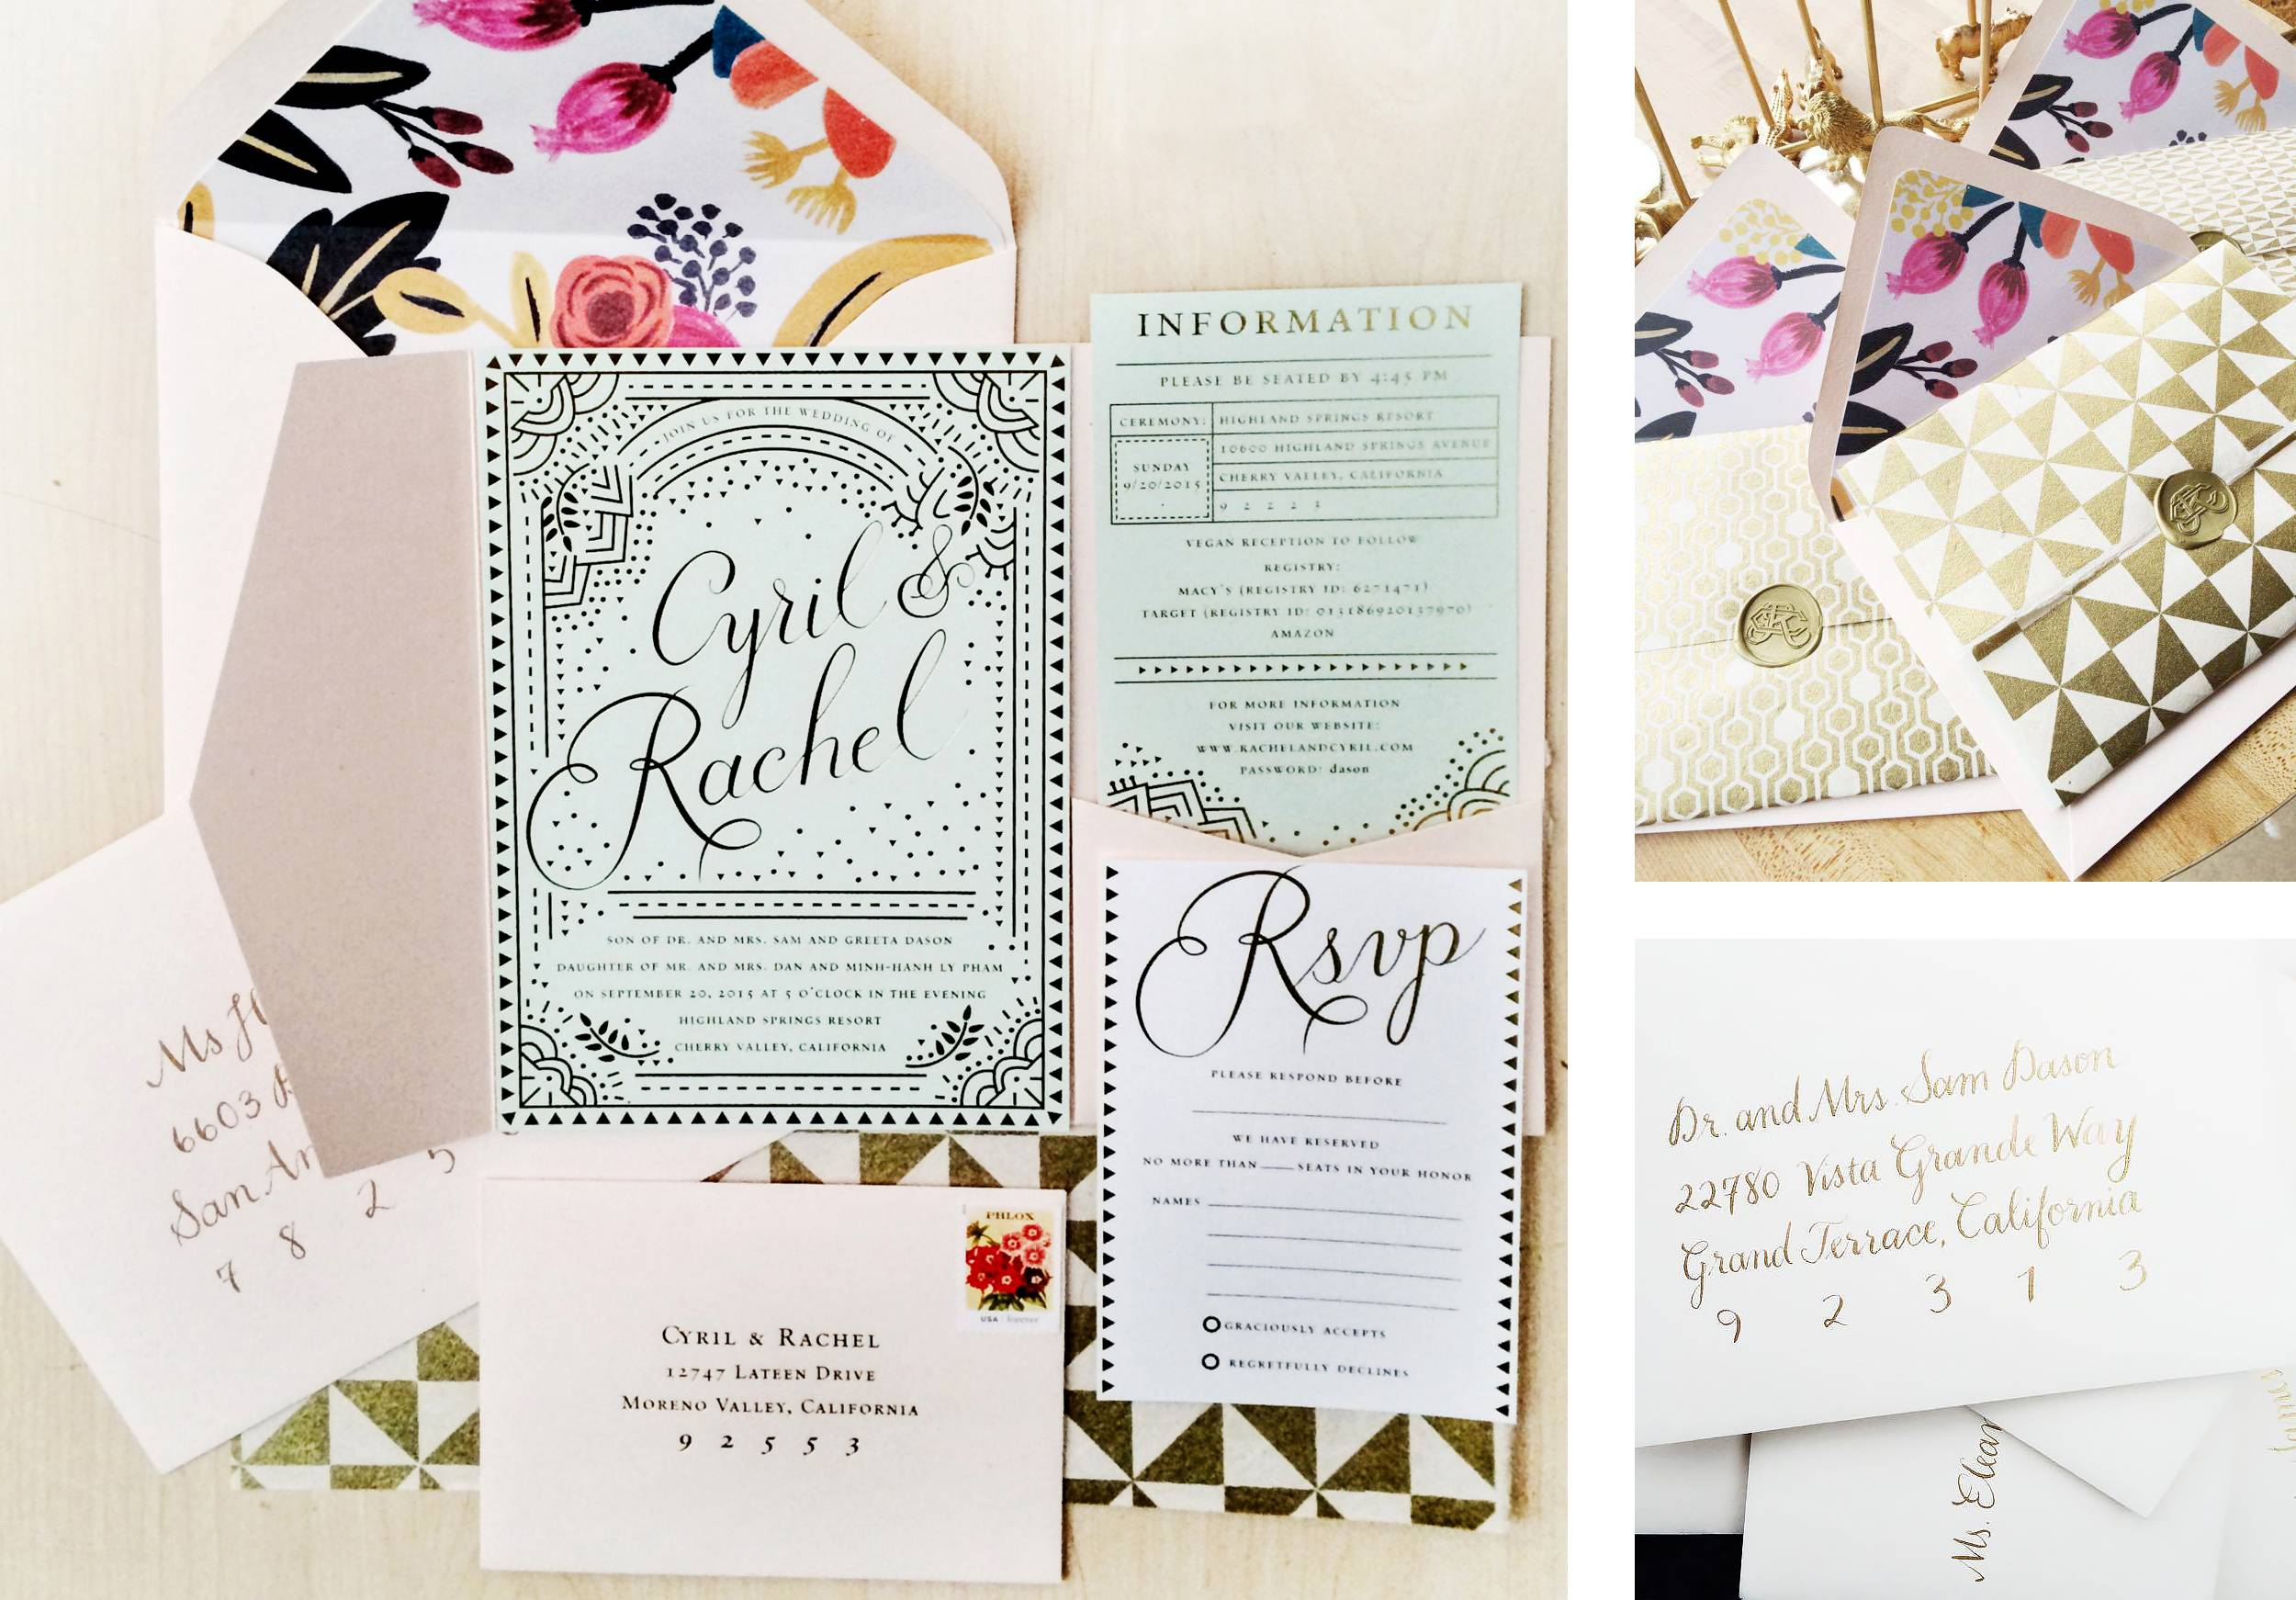 rachel-dason-calligraphyorg-invitation-4.jpg